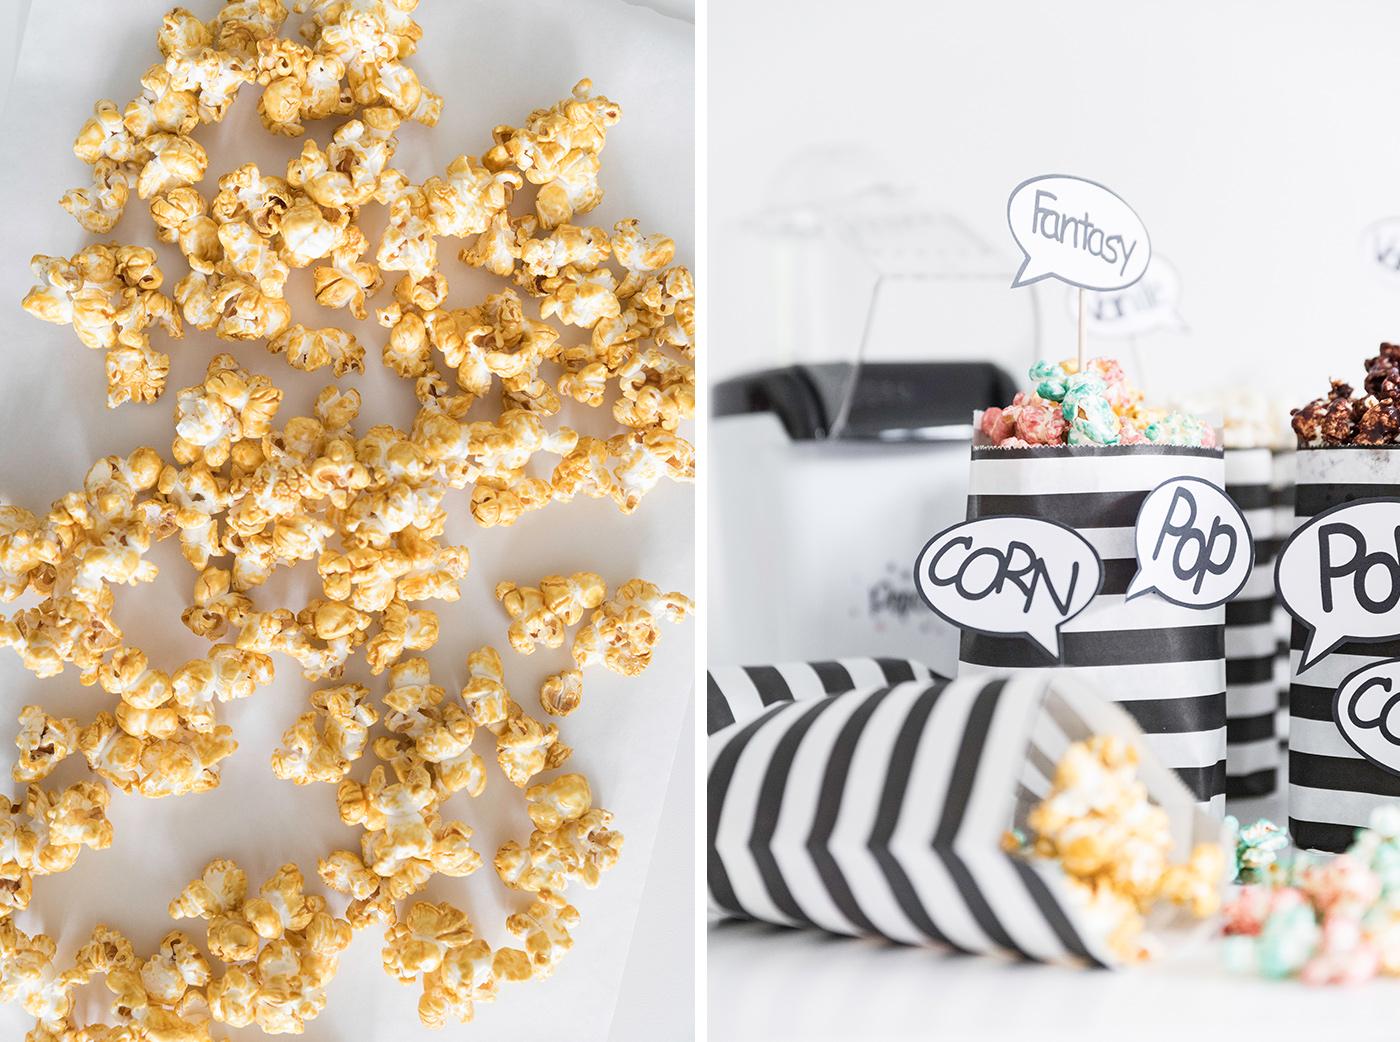 Popcorn wie im Kino - Popcorn Vanille-Caramel